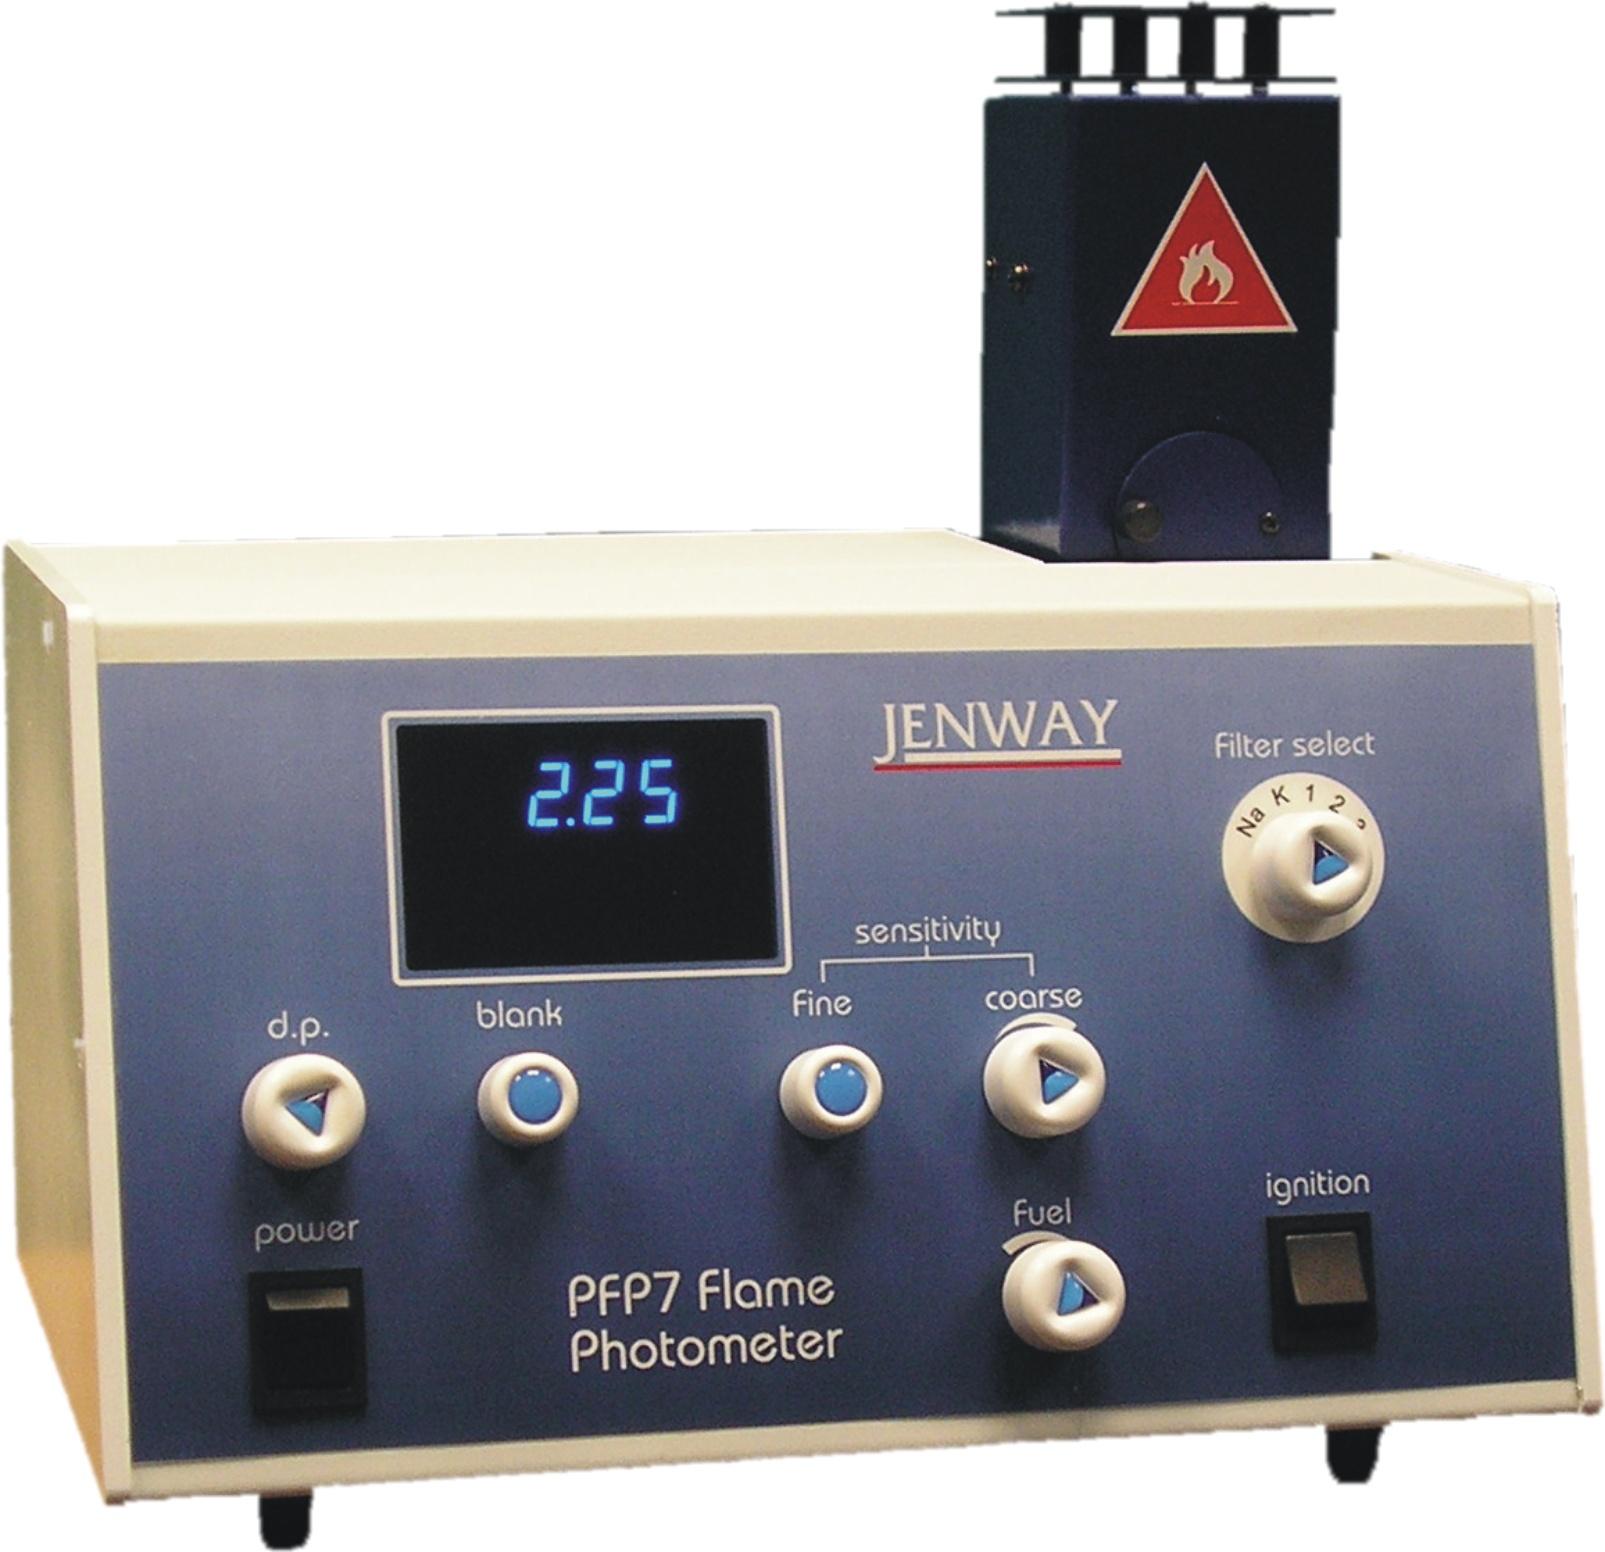 PFP7 Flame Photometer